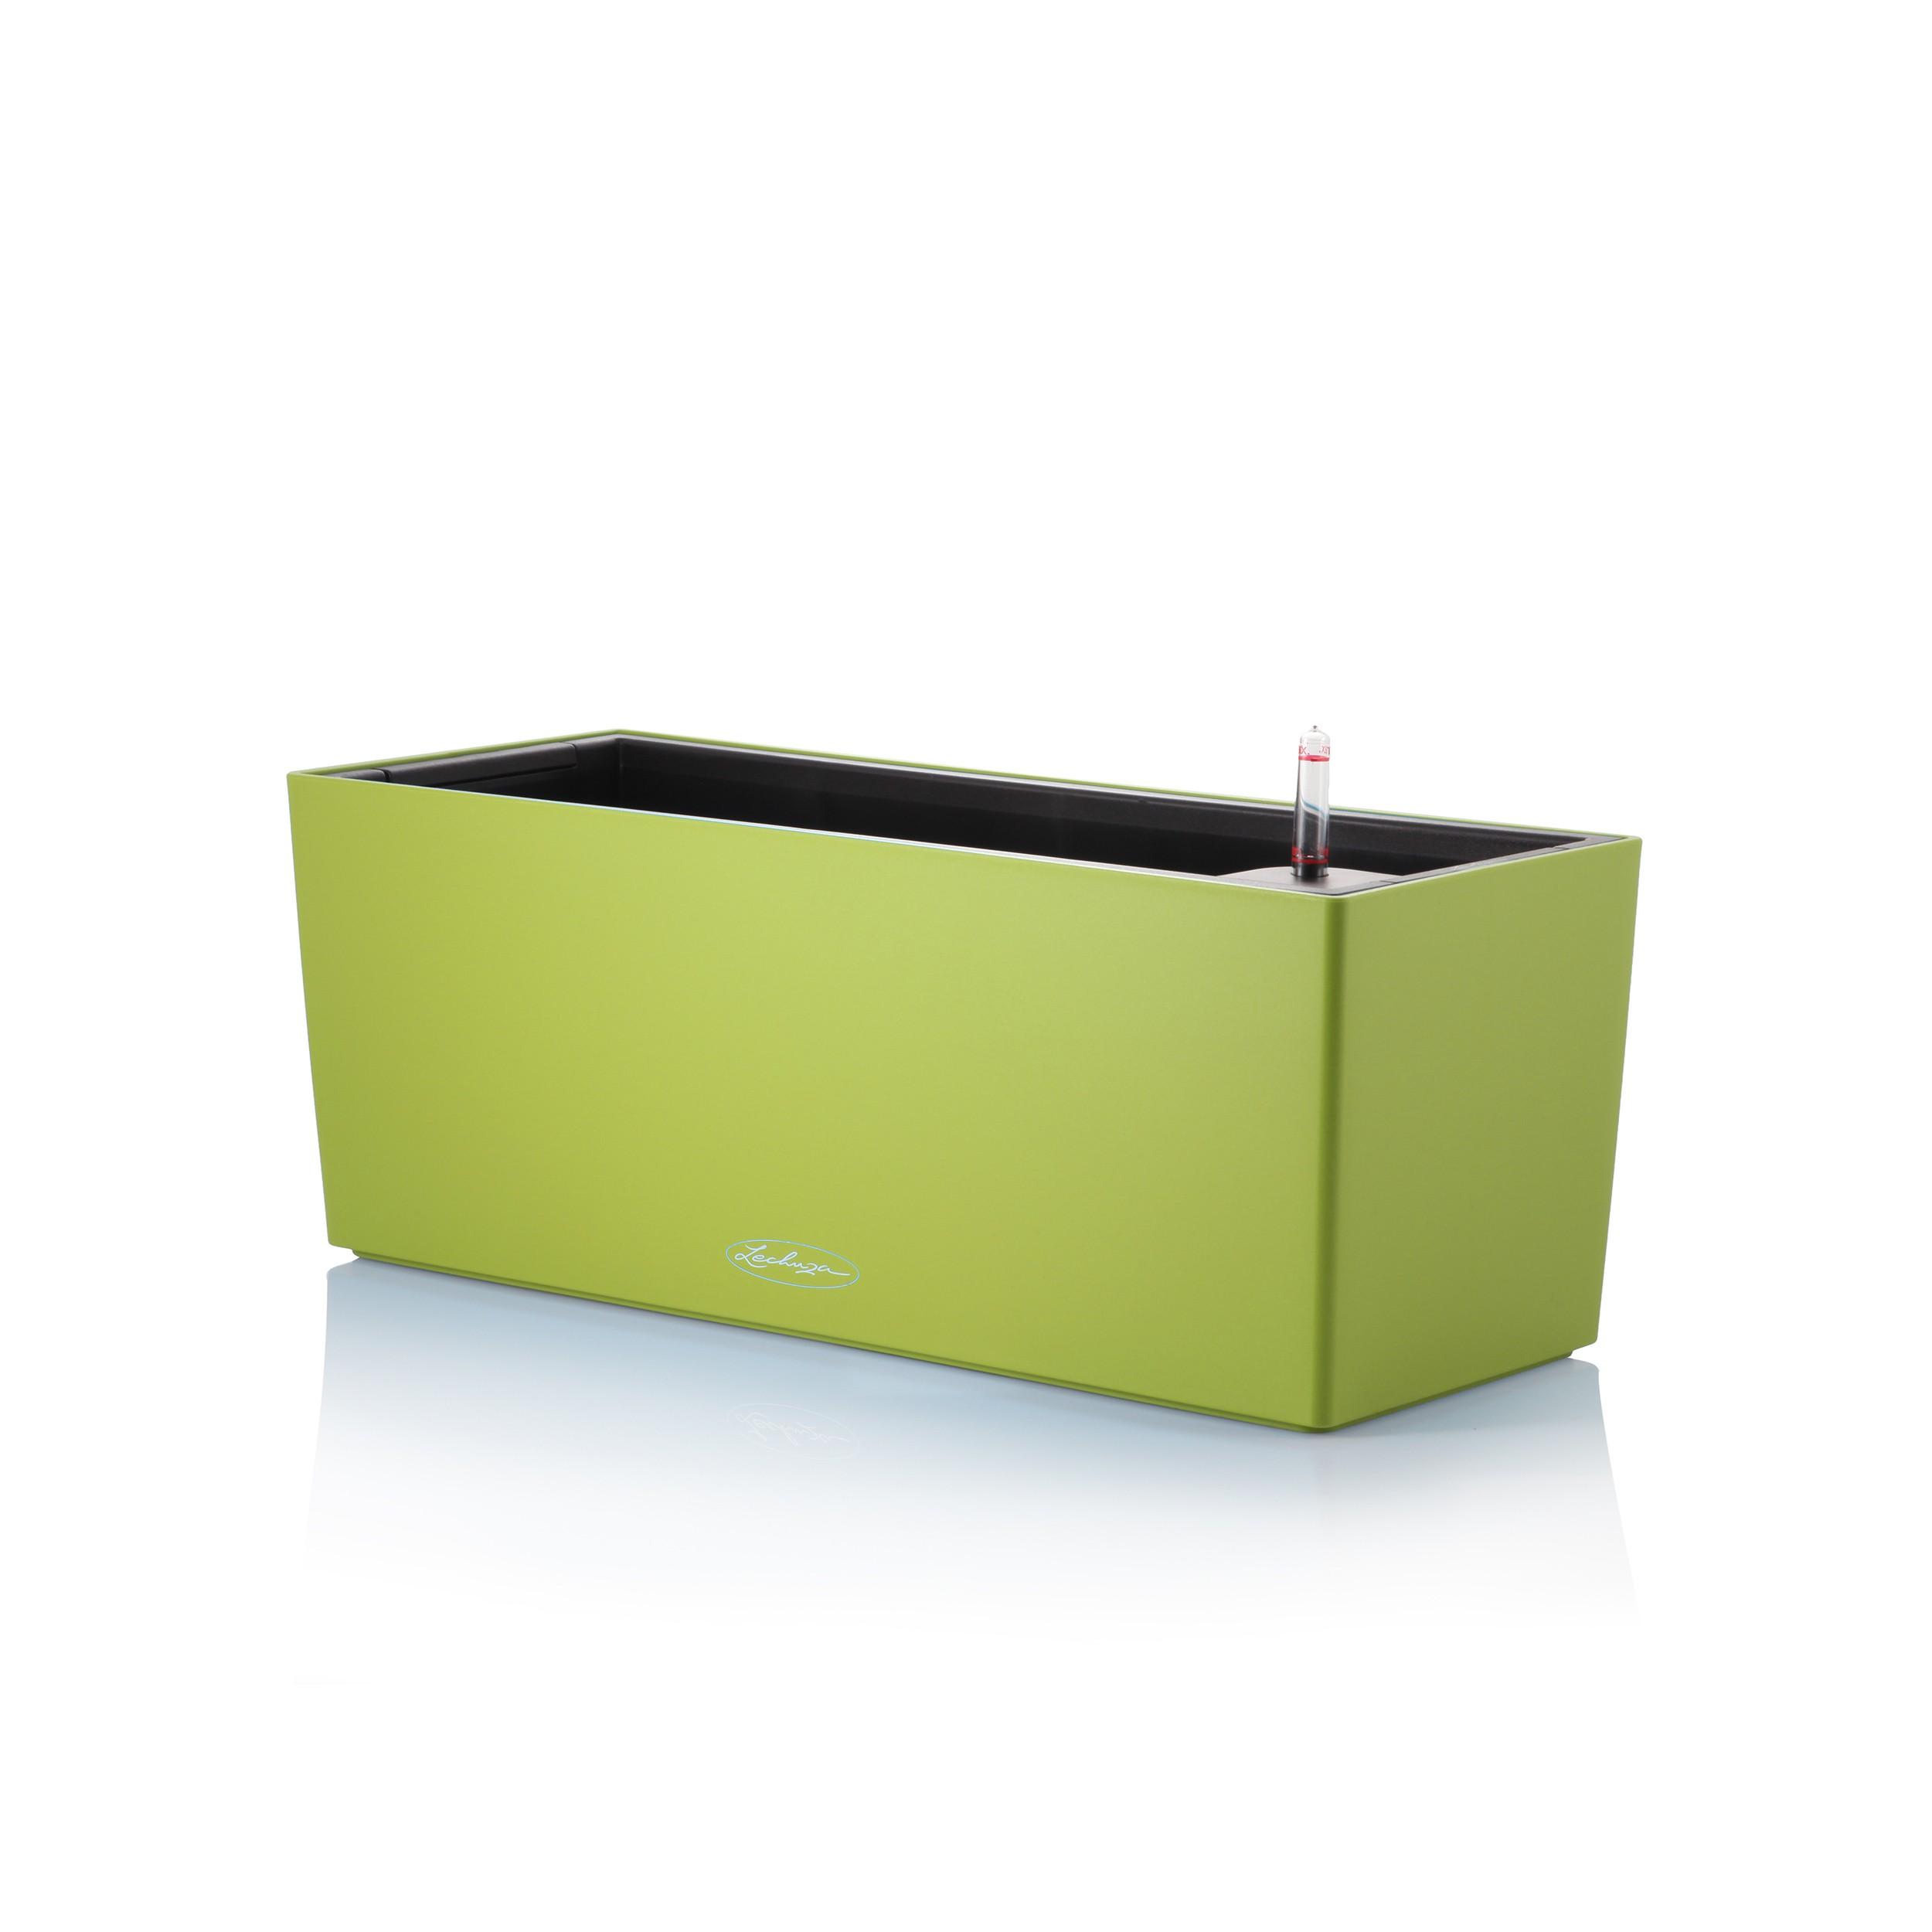 lechuza blumenkasten balconera color all in one set l50cm. Black Bedroom Furniture Sets. Home Design Ideas